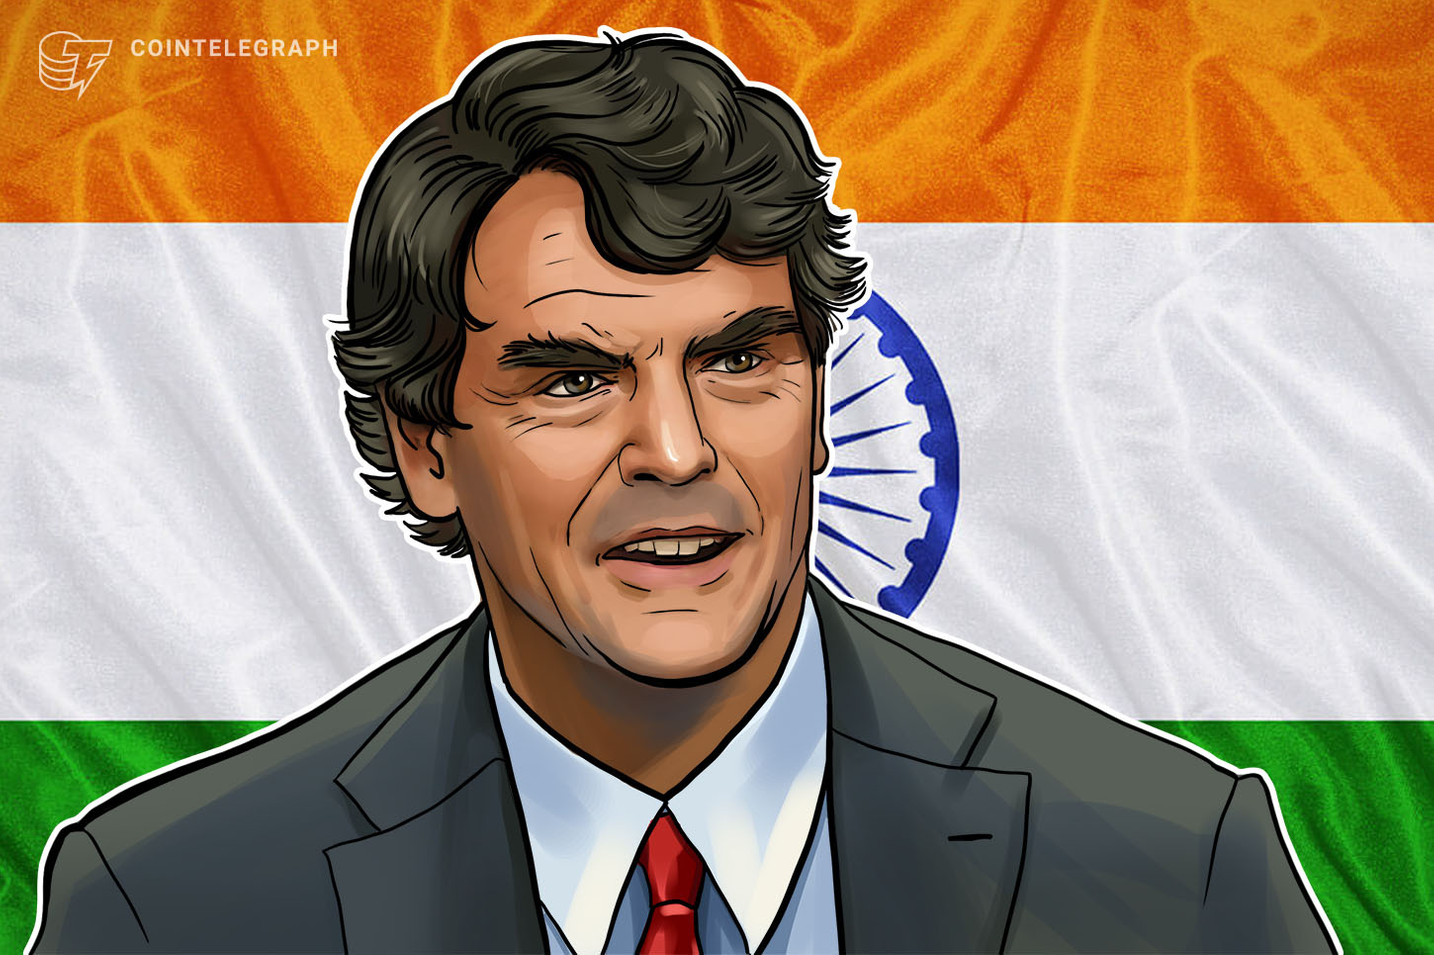 'Pathetic and Corrupt' —  Tim Draper Slams Proposed Bitcoin Ban in India